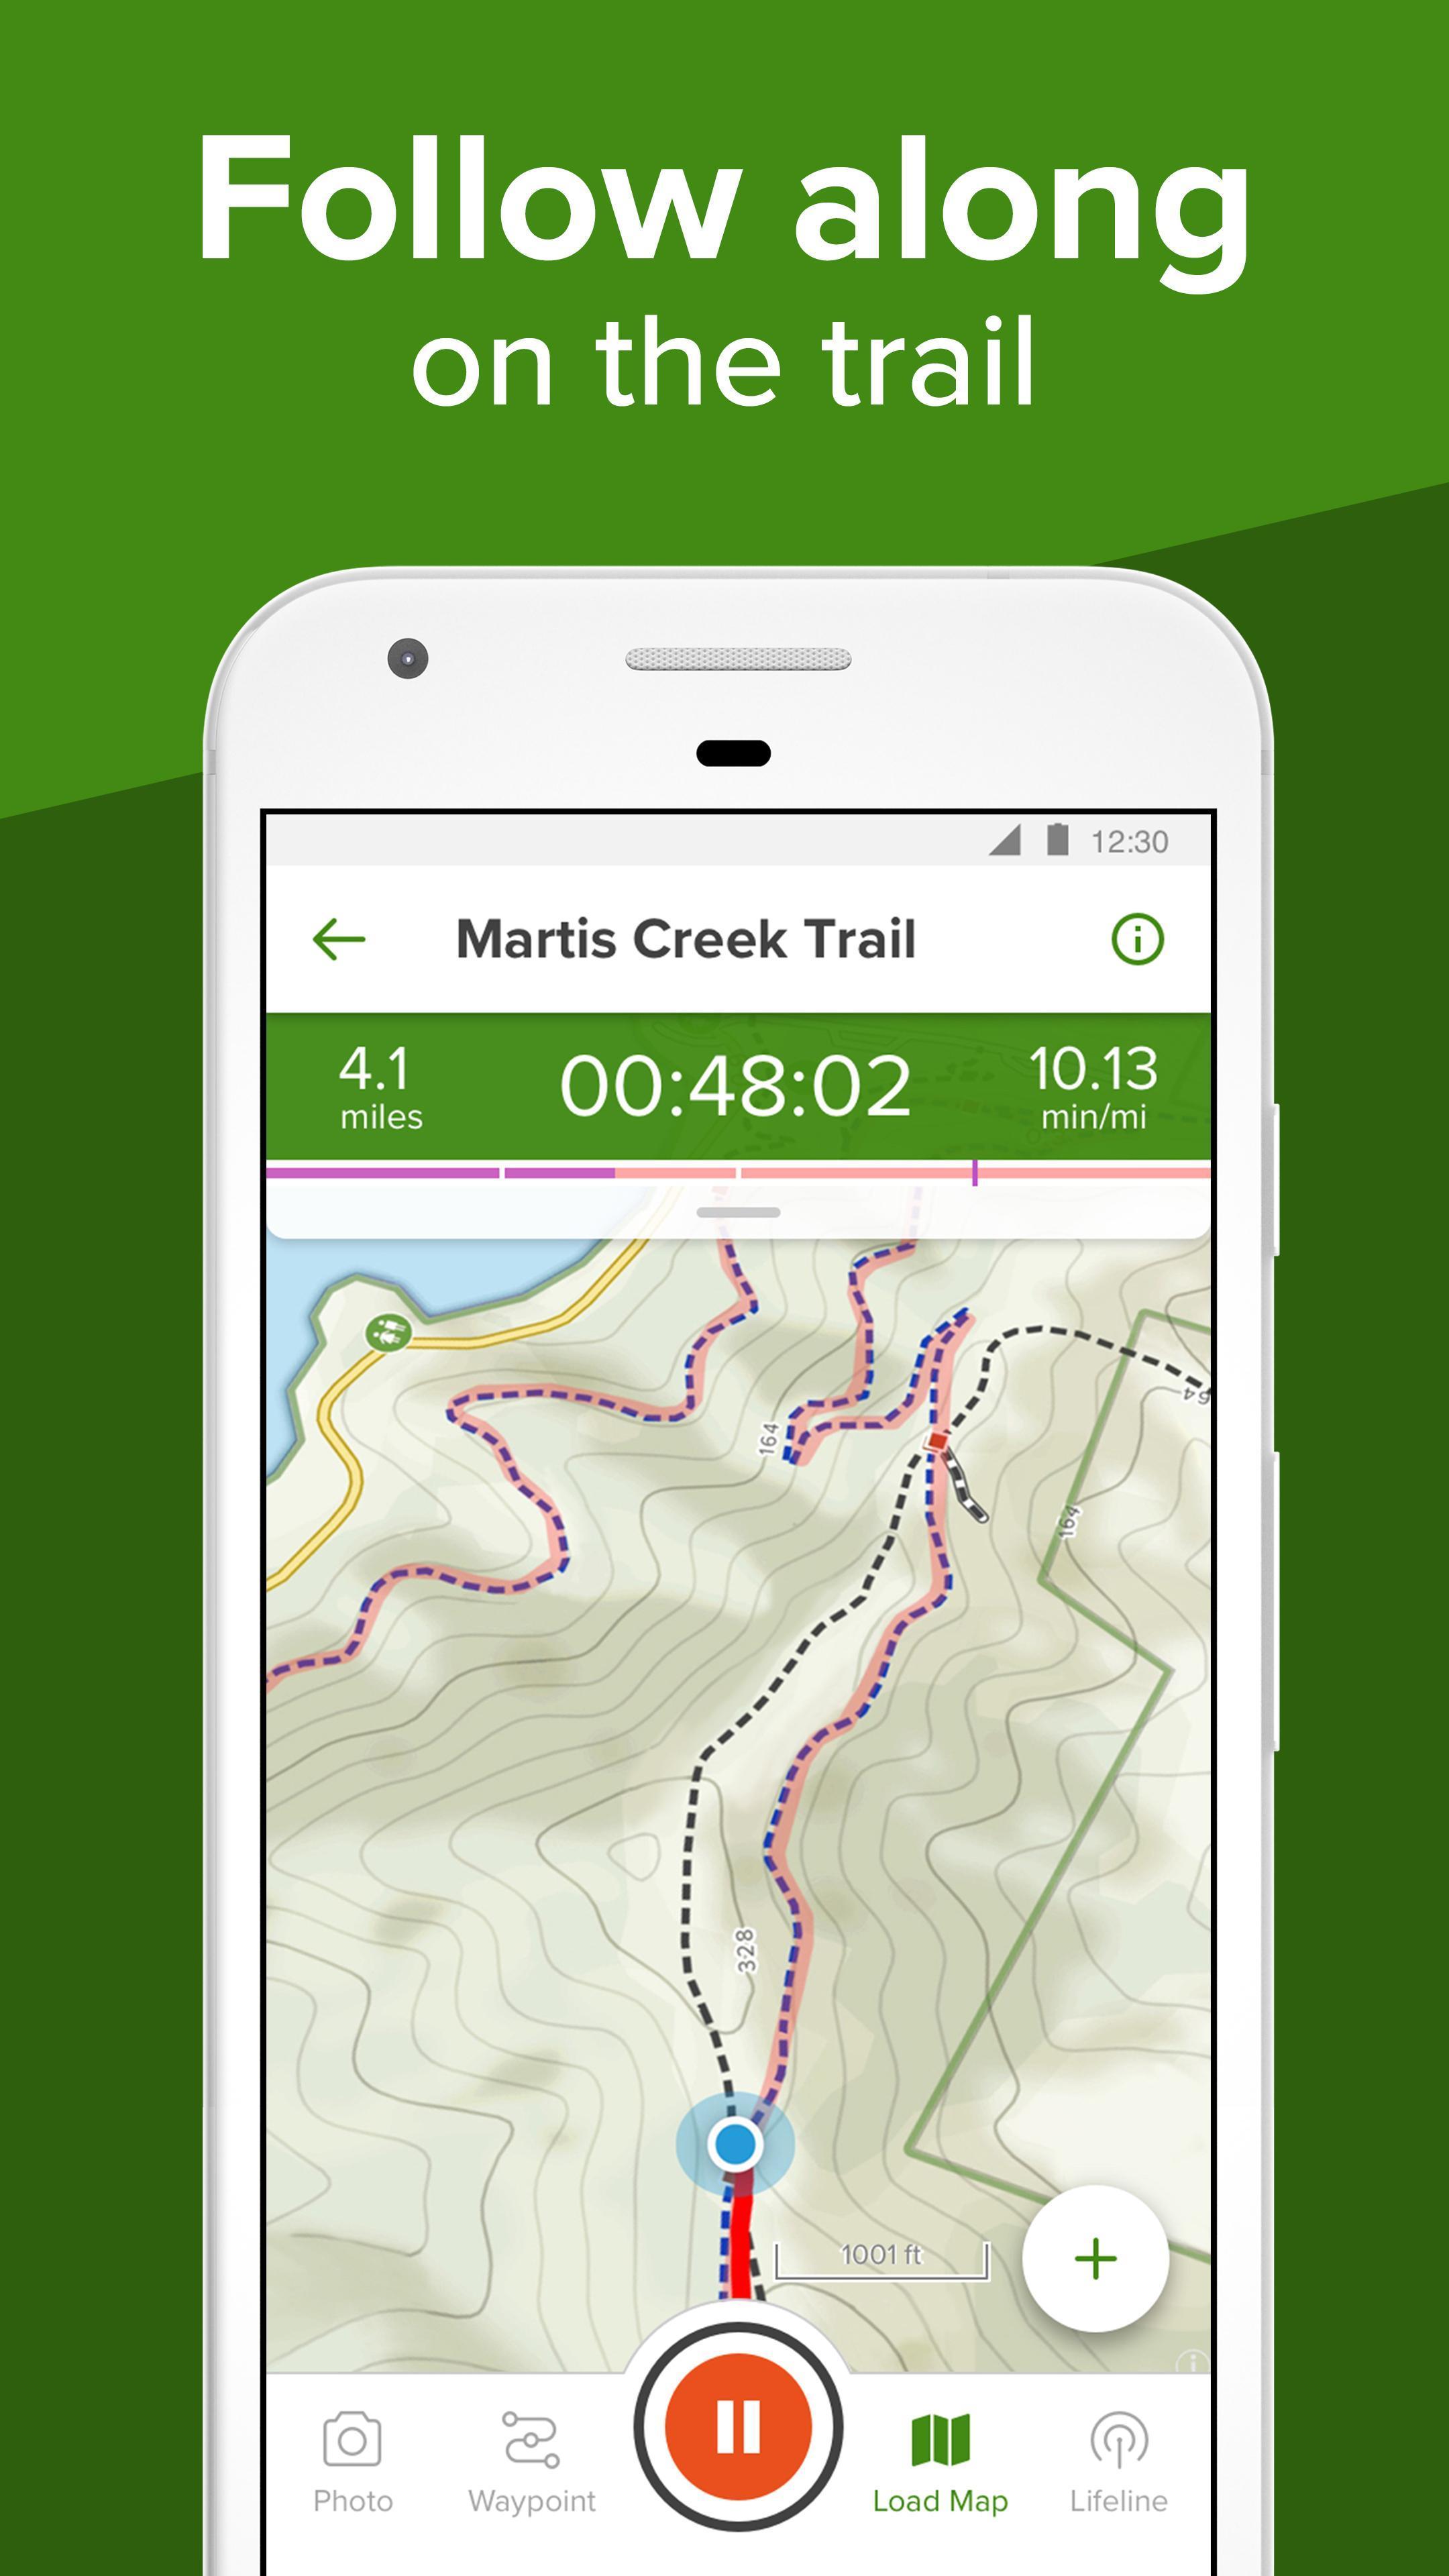 AllTrails Hiking, Running & Mountain Bike Trails 9.1.10 Screenshot 4